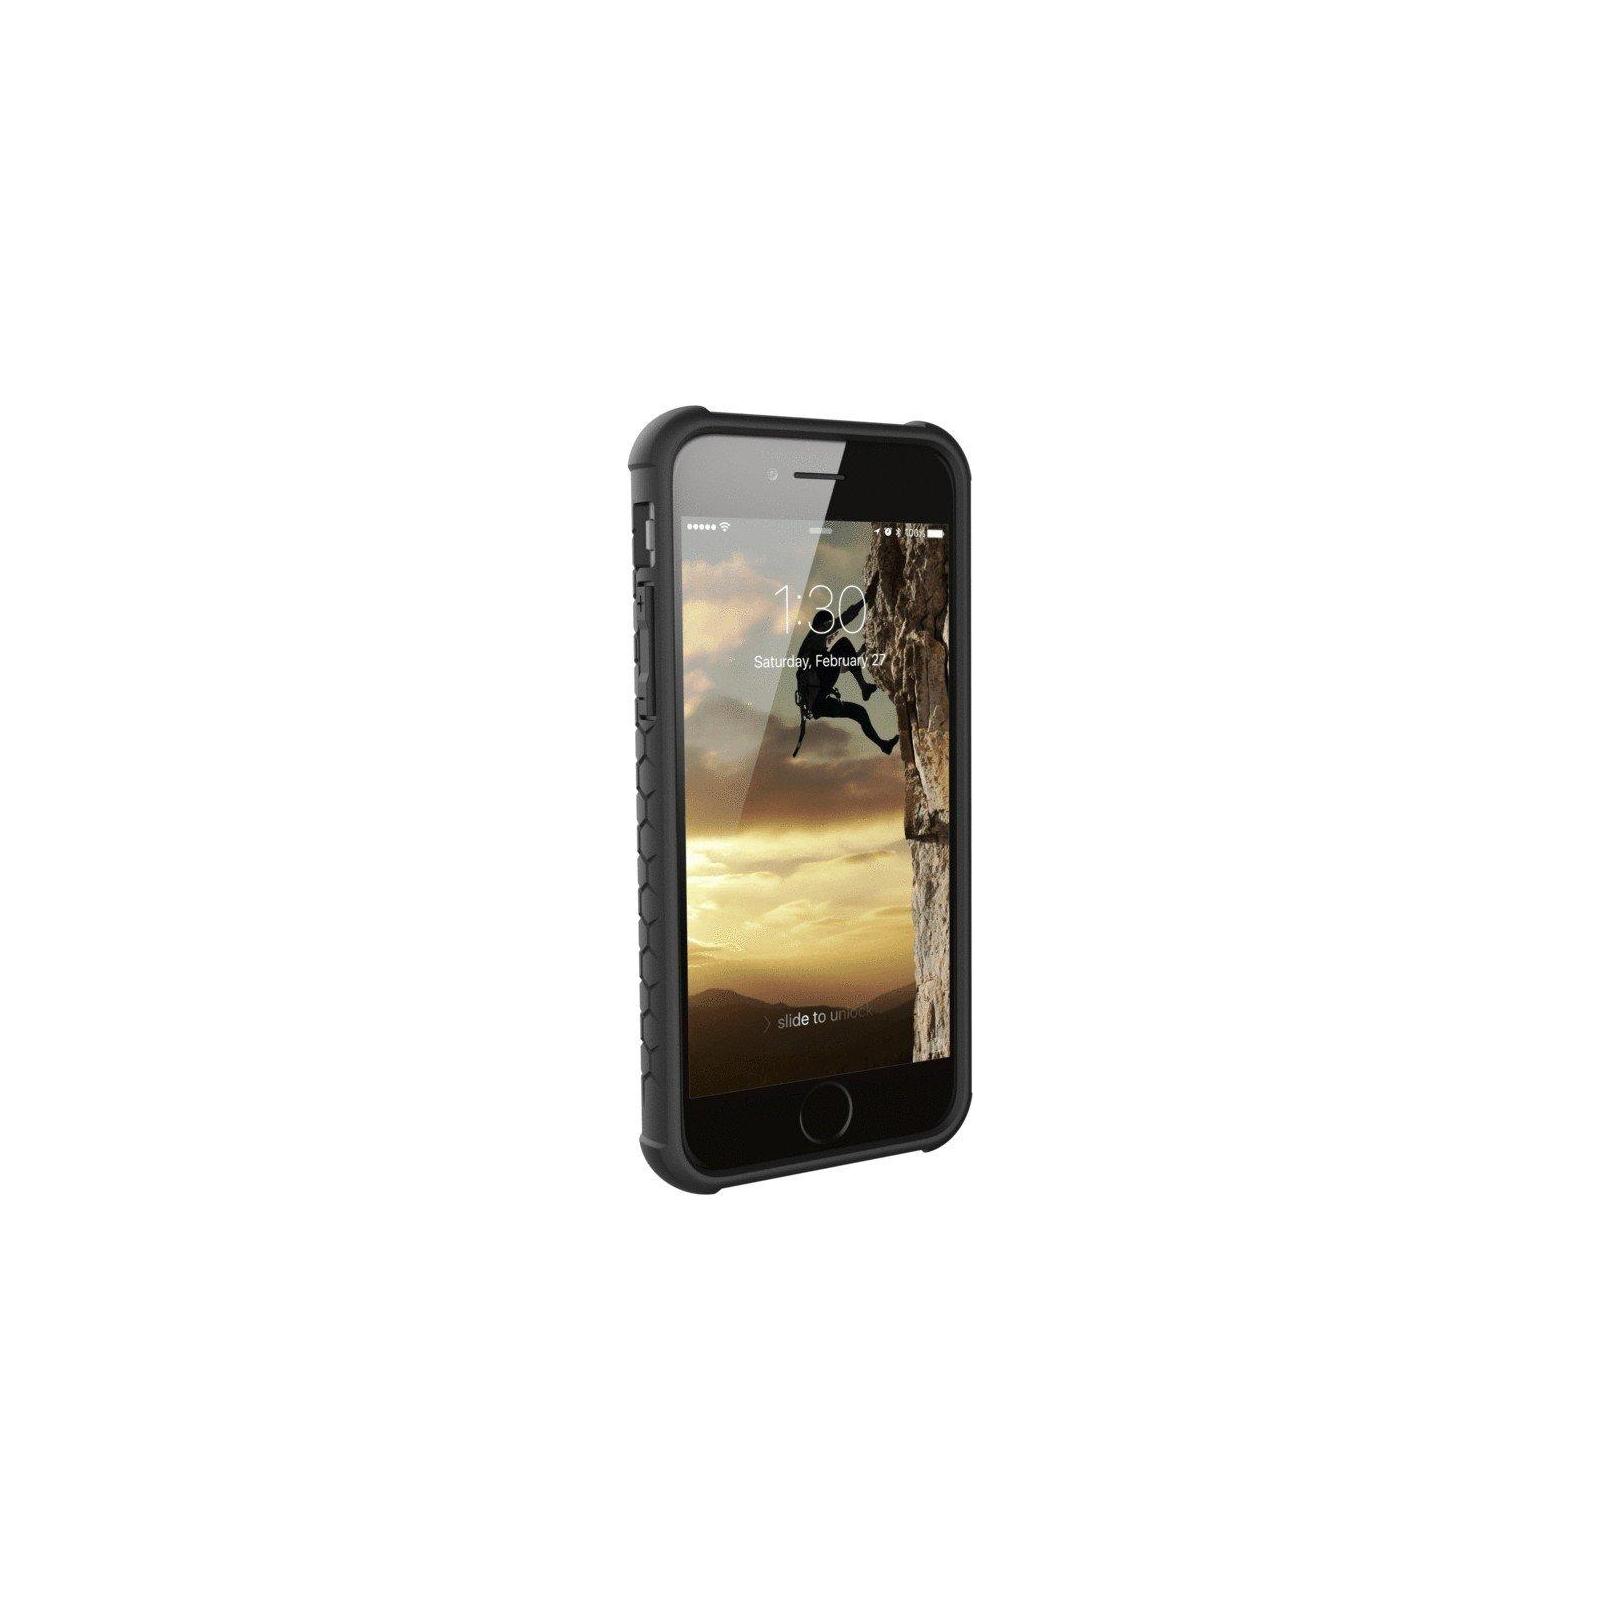 Чехол для моб. телефона Urban Armor Gear iPhone 8/7/6S/6 Monarch Graphite Black (IPH8/7-M-GR) изображение 5